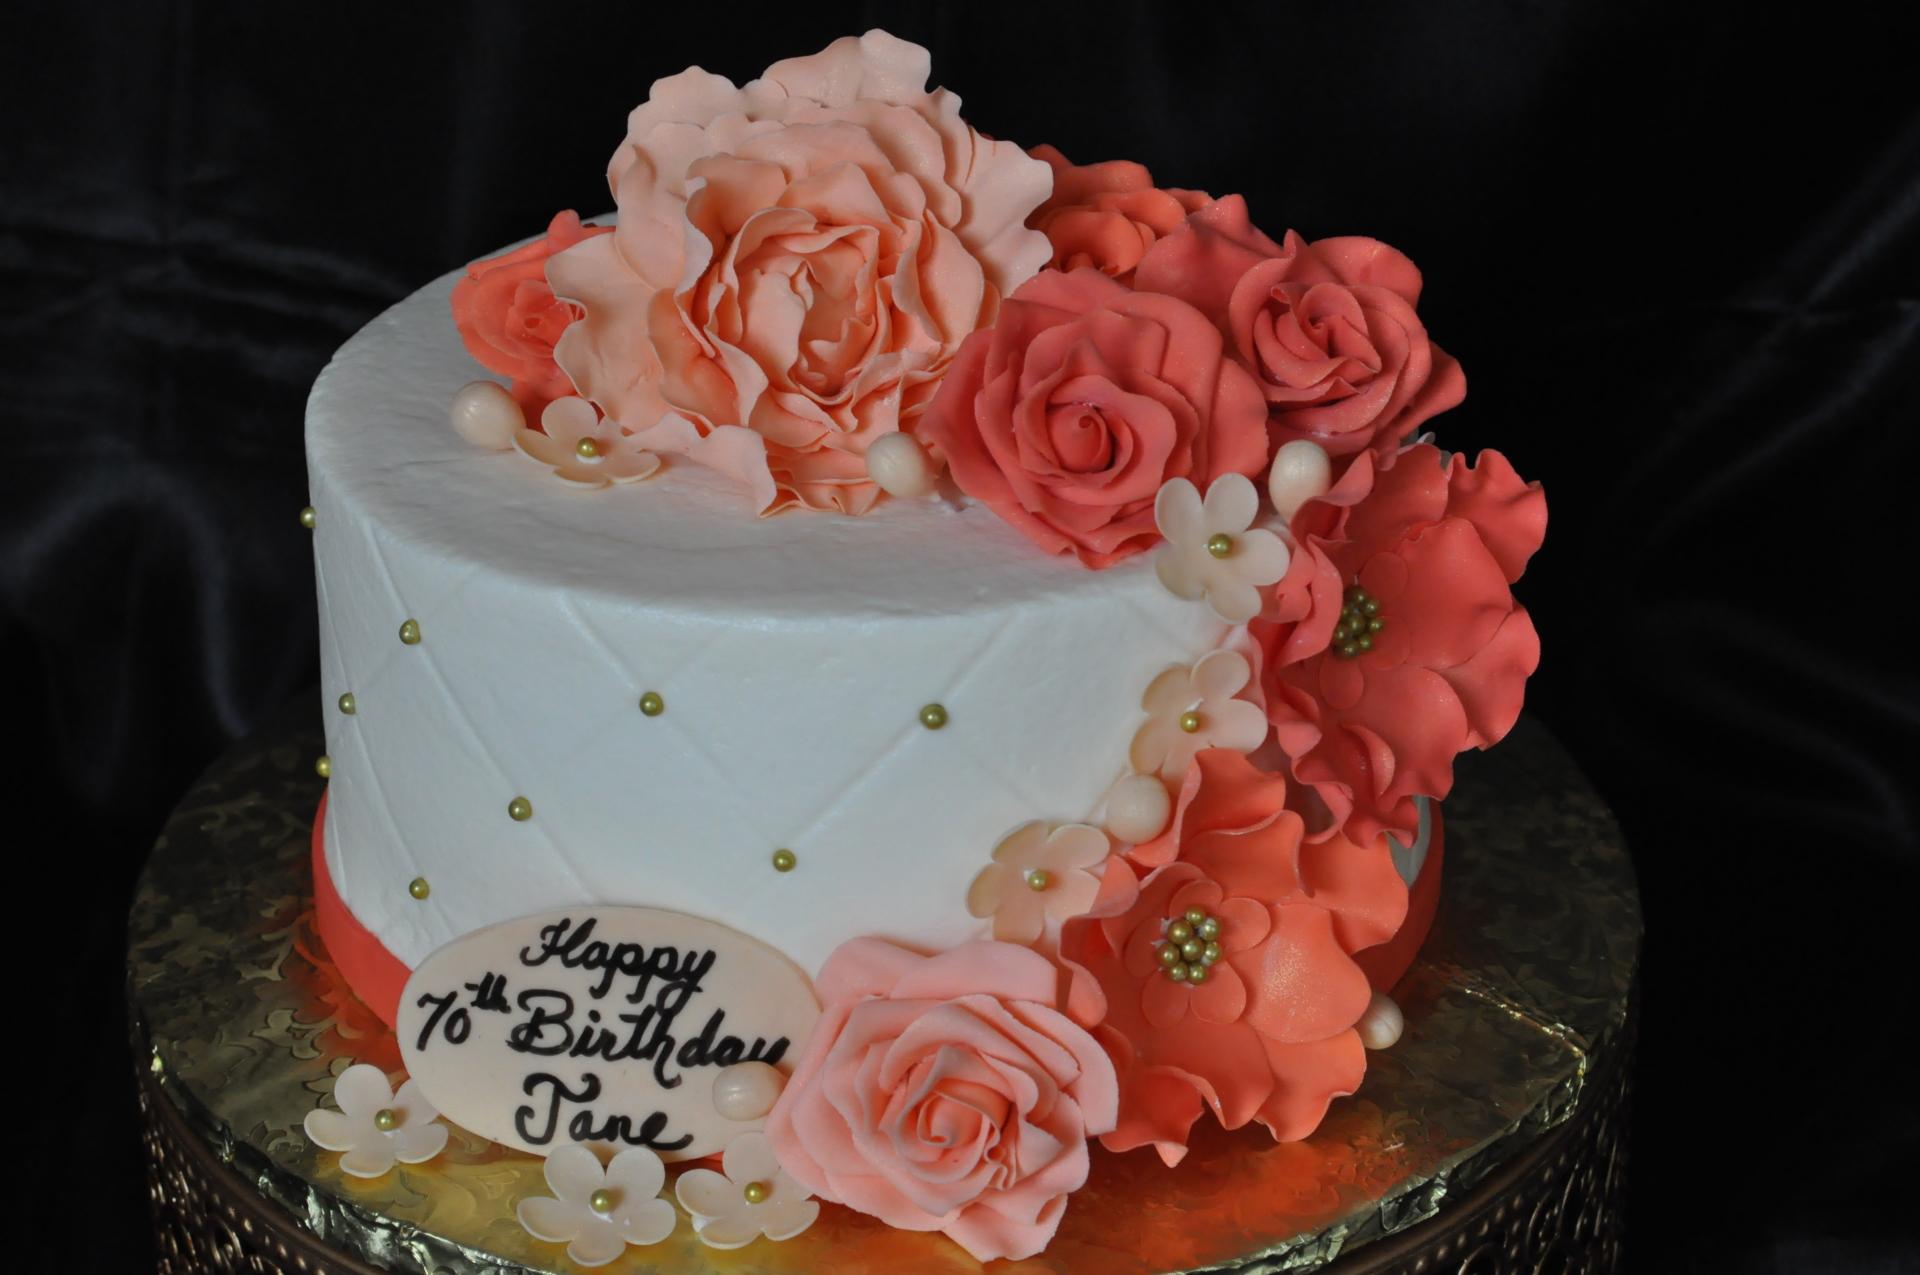 Peach flowers birthday cake, gumpaste flowers